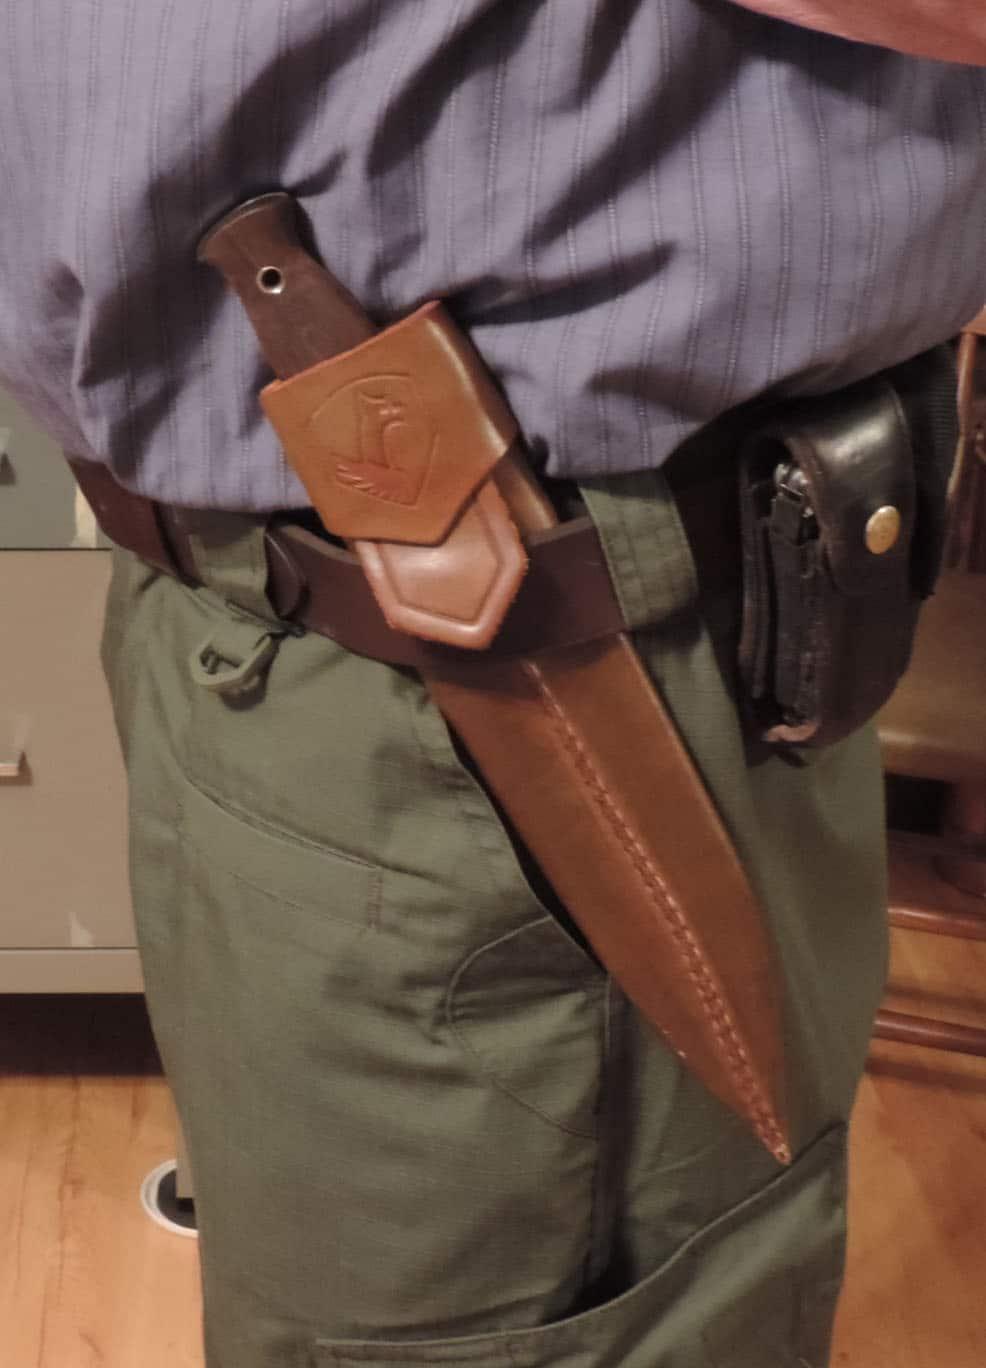 A Review Of The Condor Primitive Bush Knife Preparedness